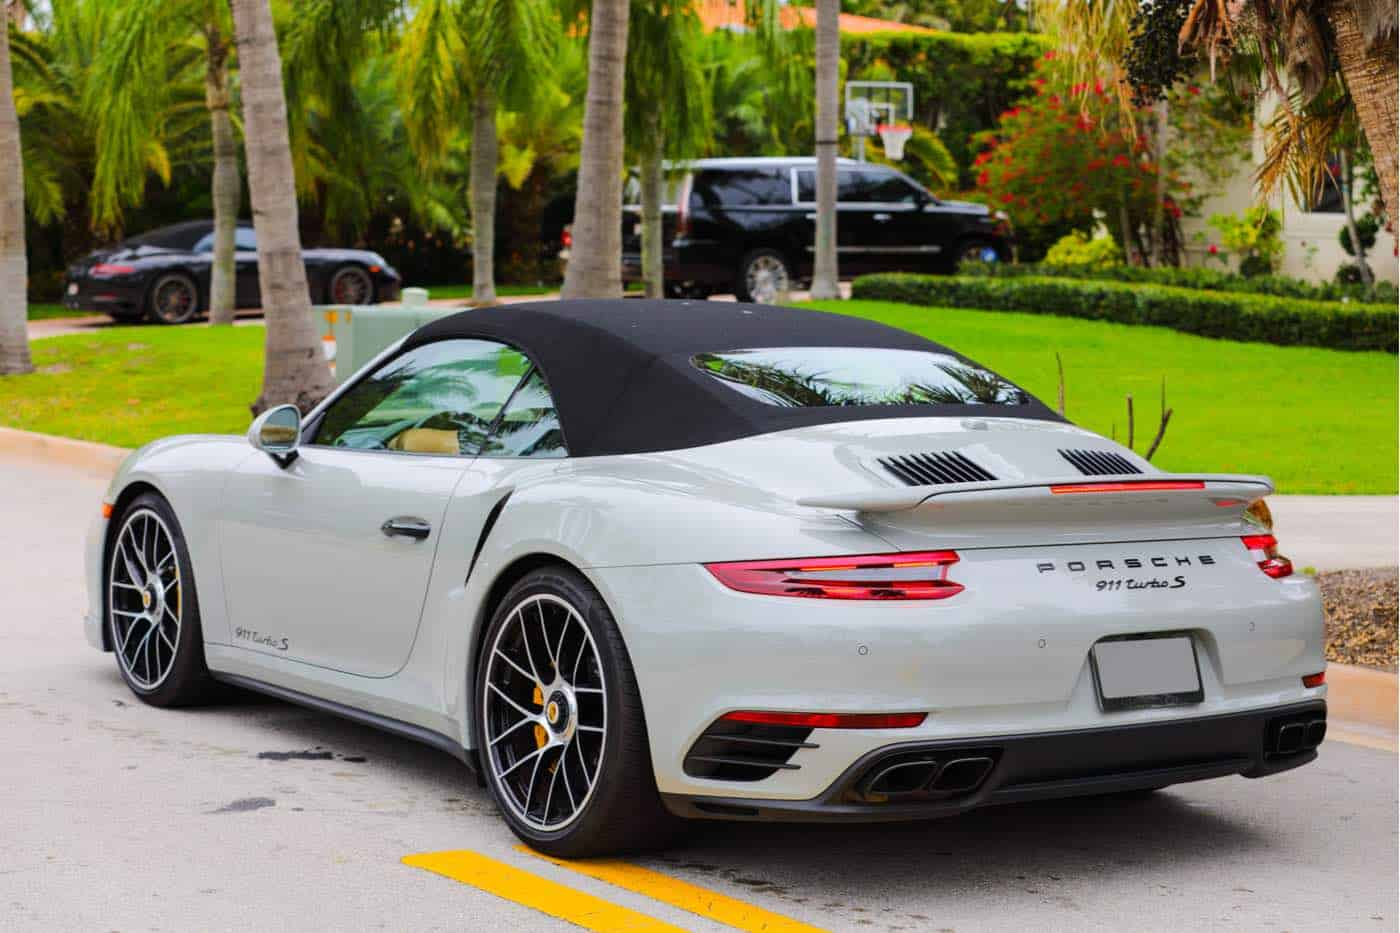 Porsche Turbo 911 S